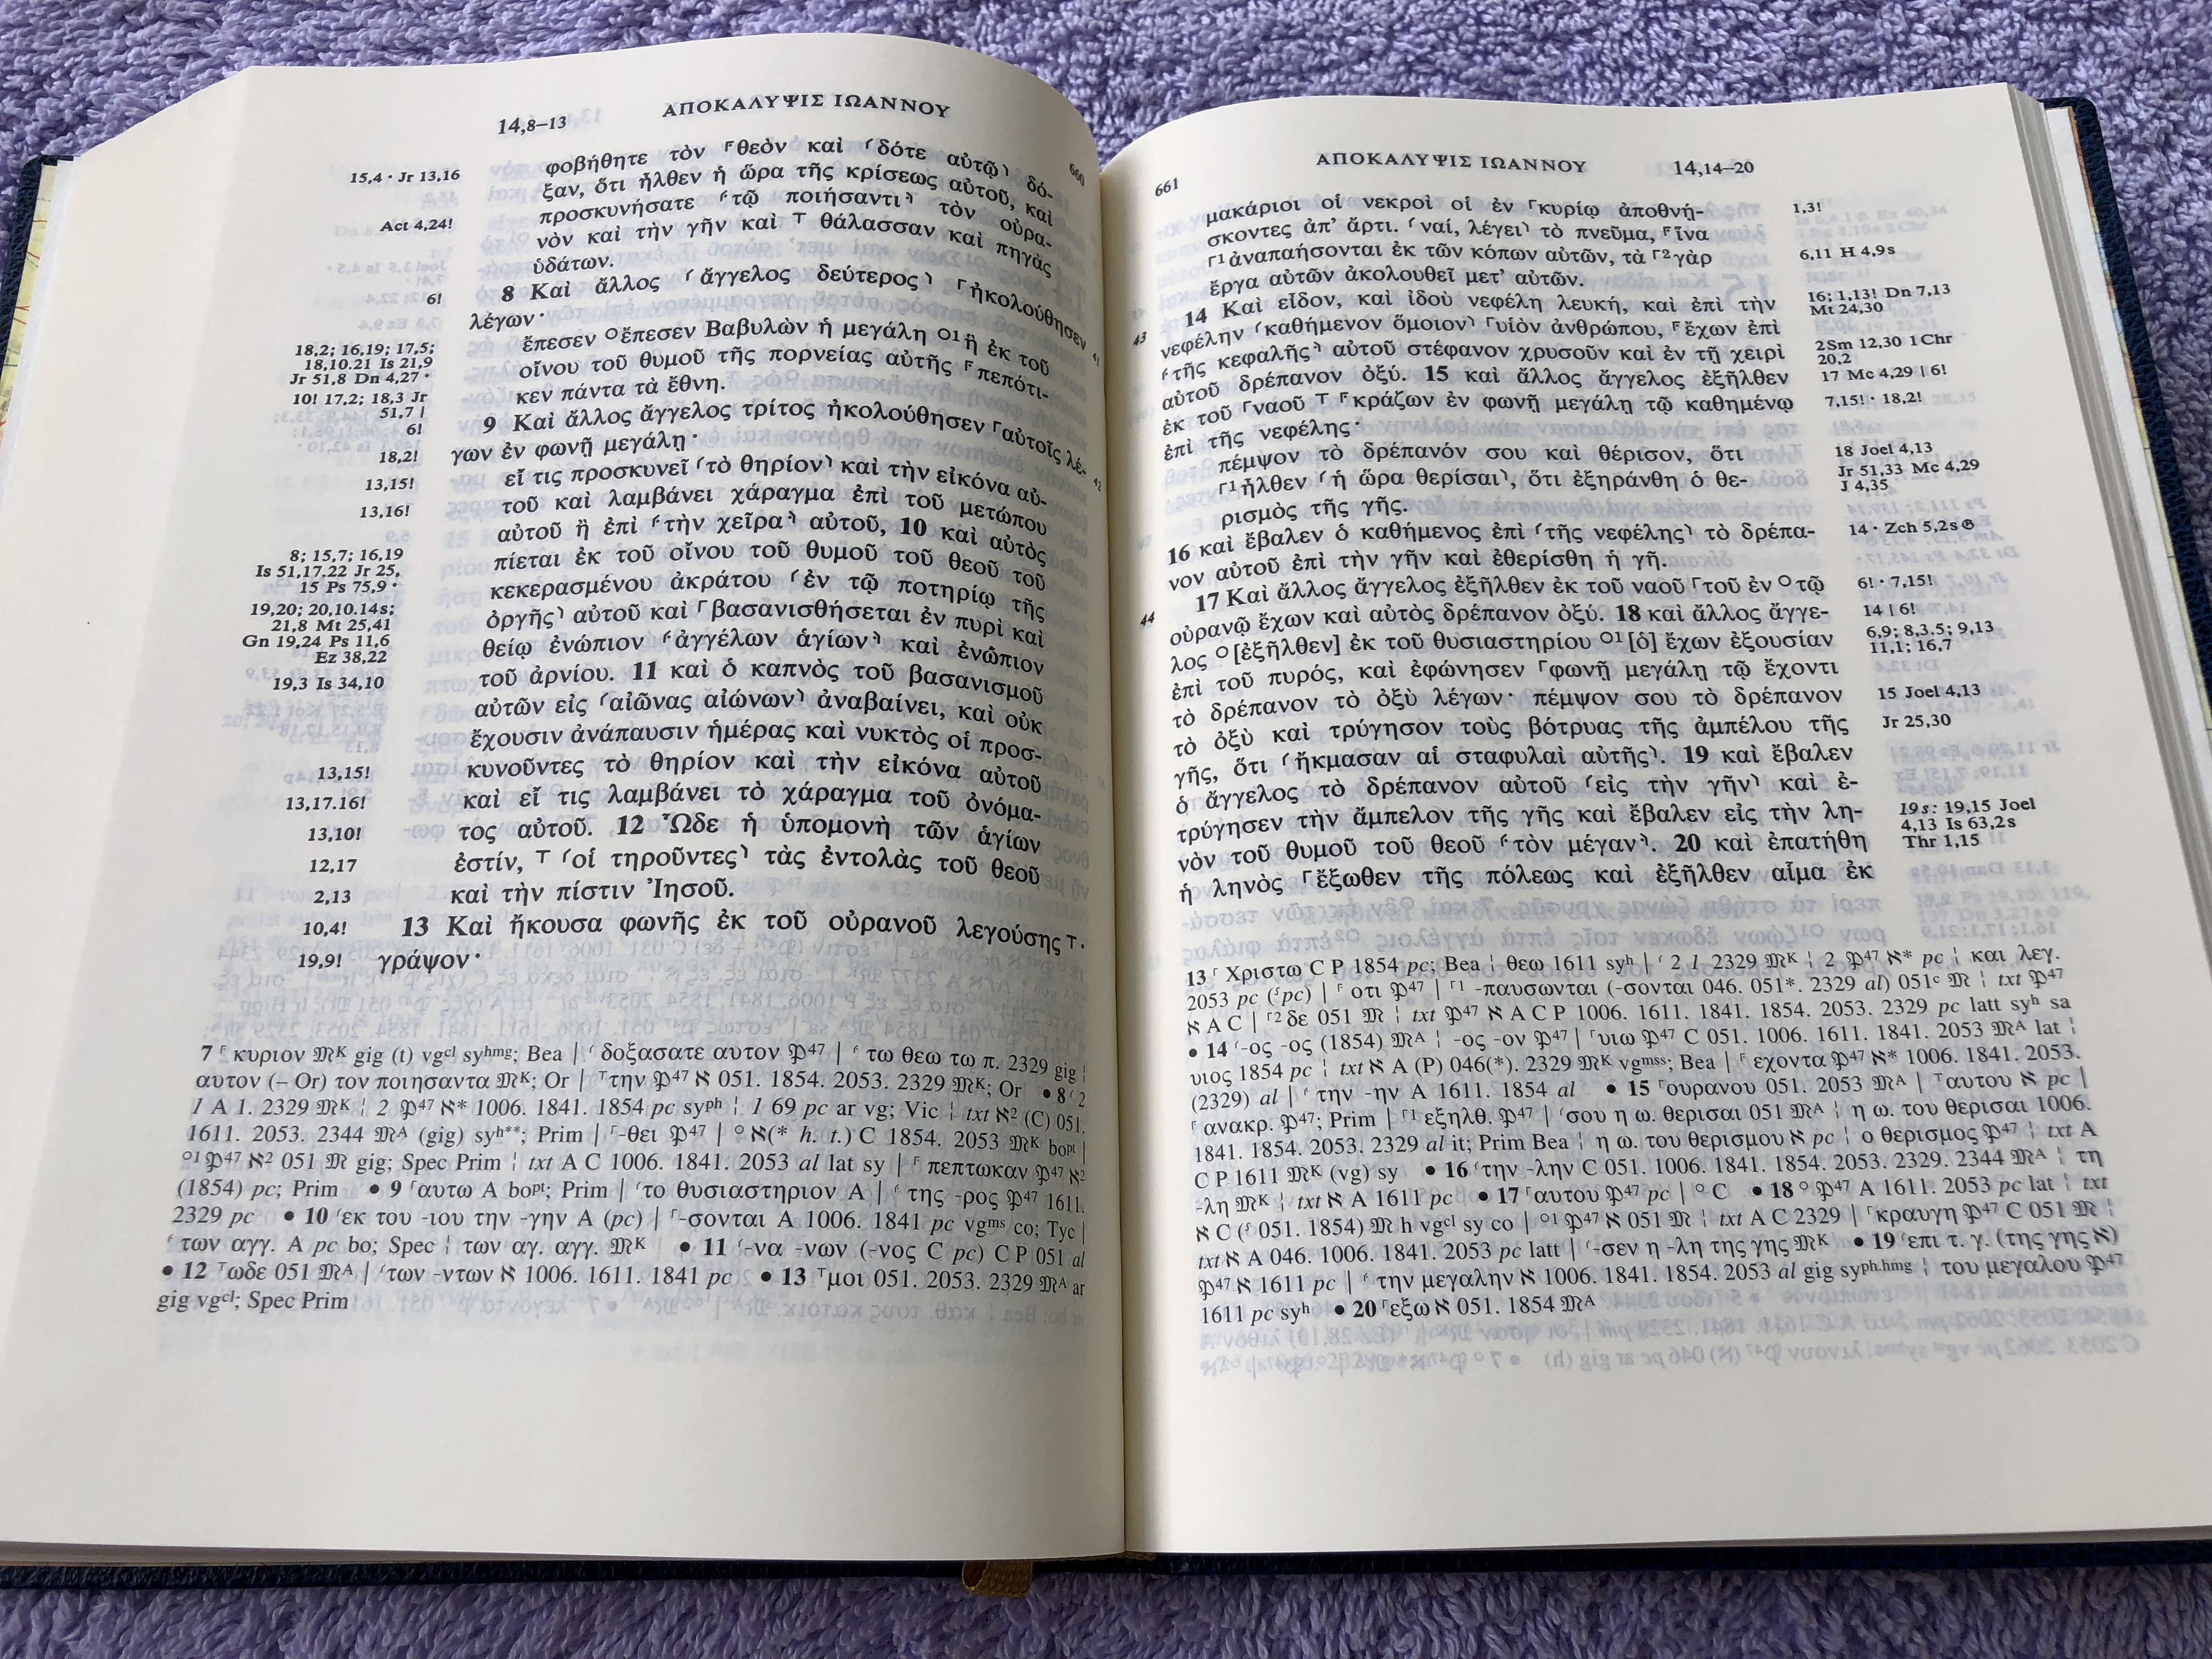 img-1655.jpg